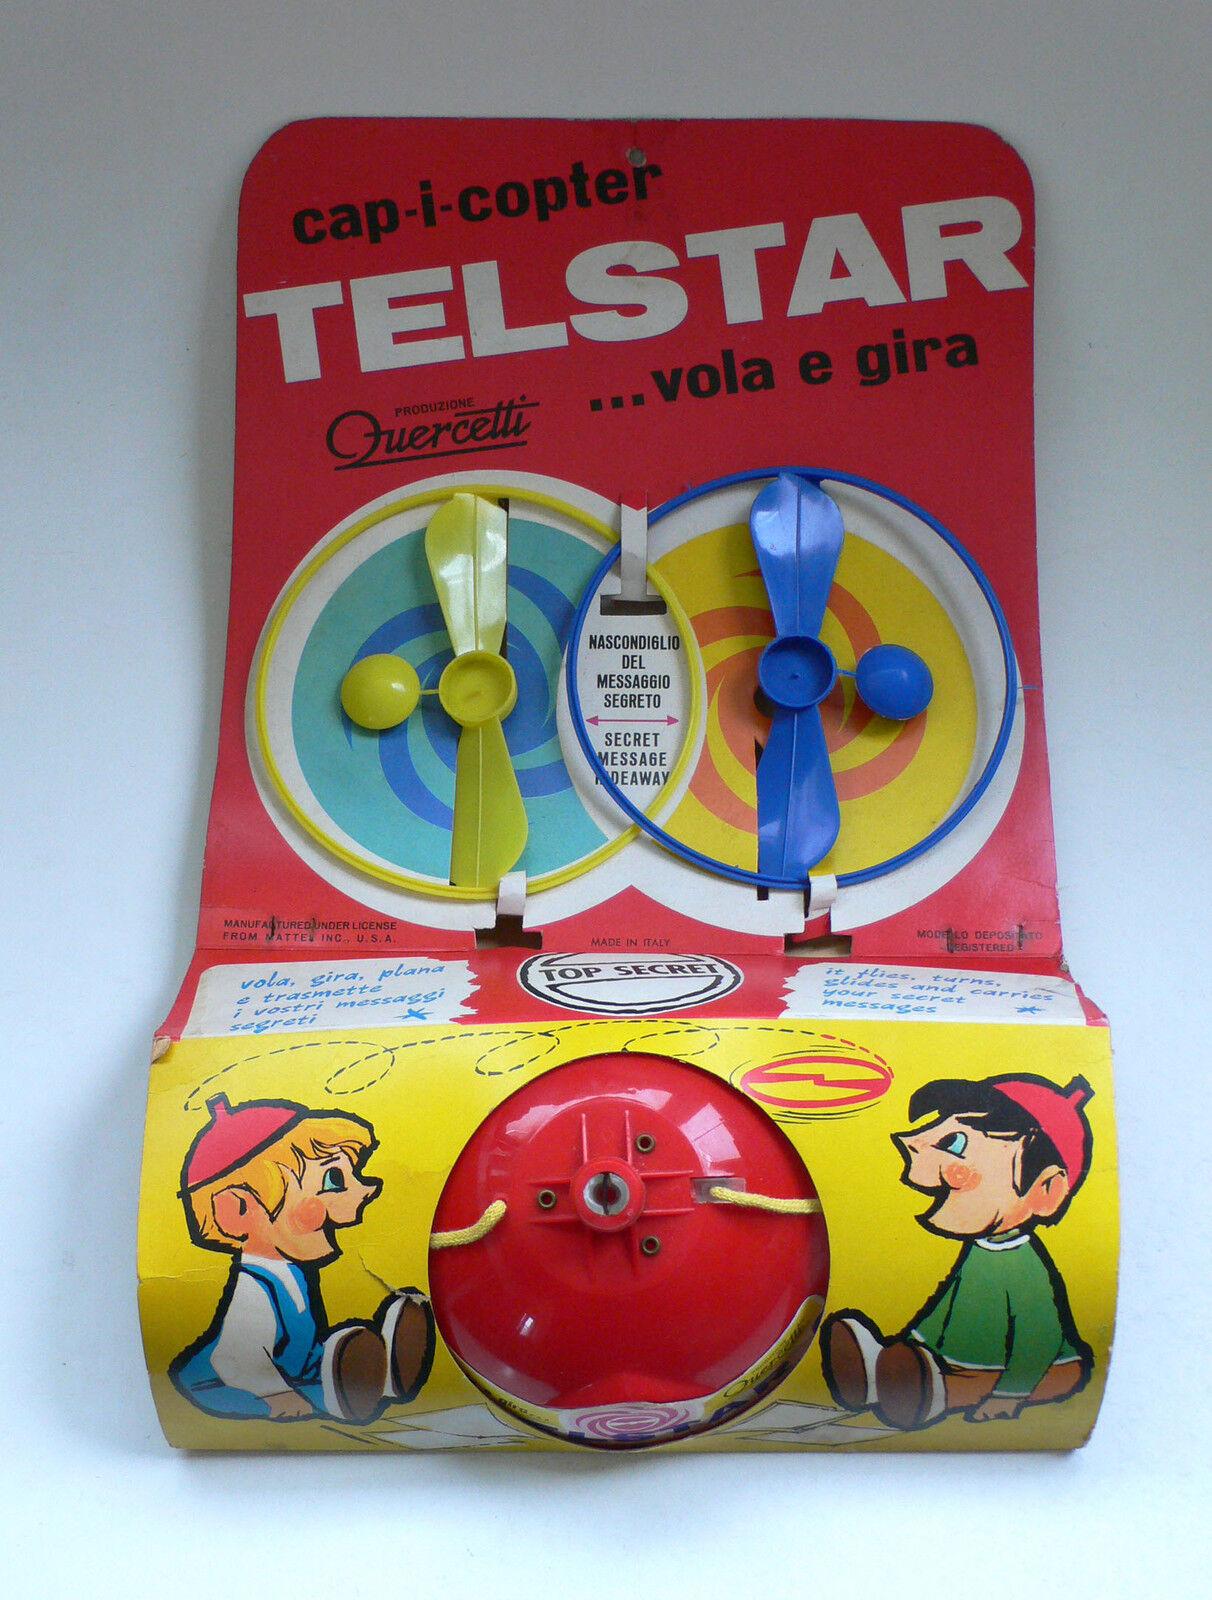 Vintage Telstar CAP-I-COPTER Beany & Cecil Copter Message Hat MOC 1960's